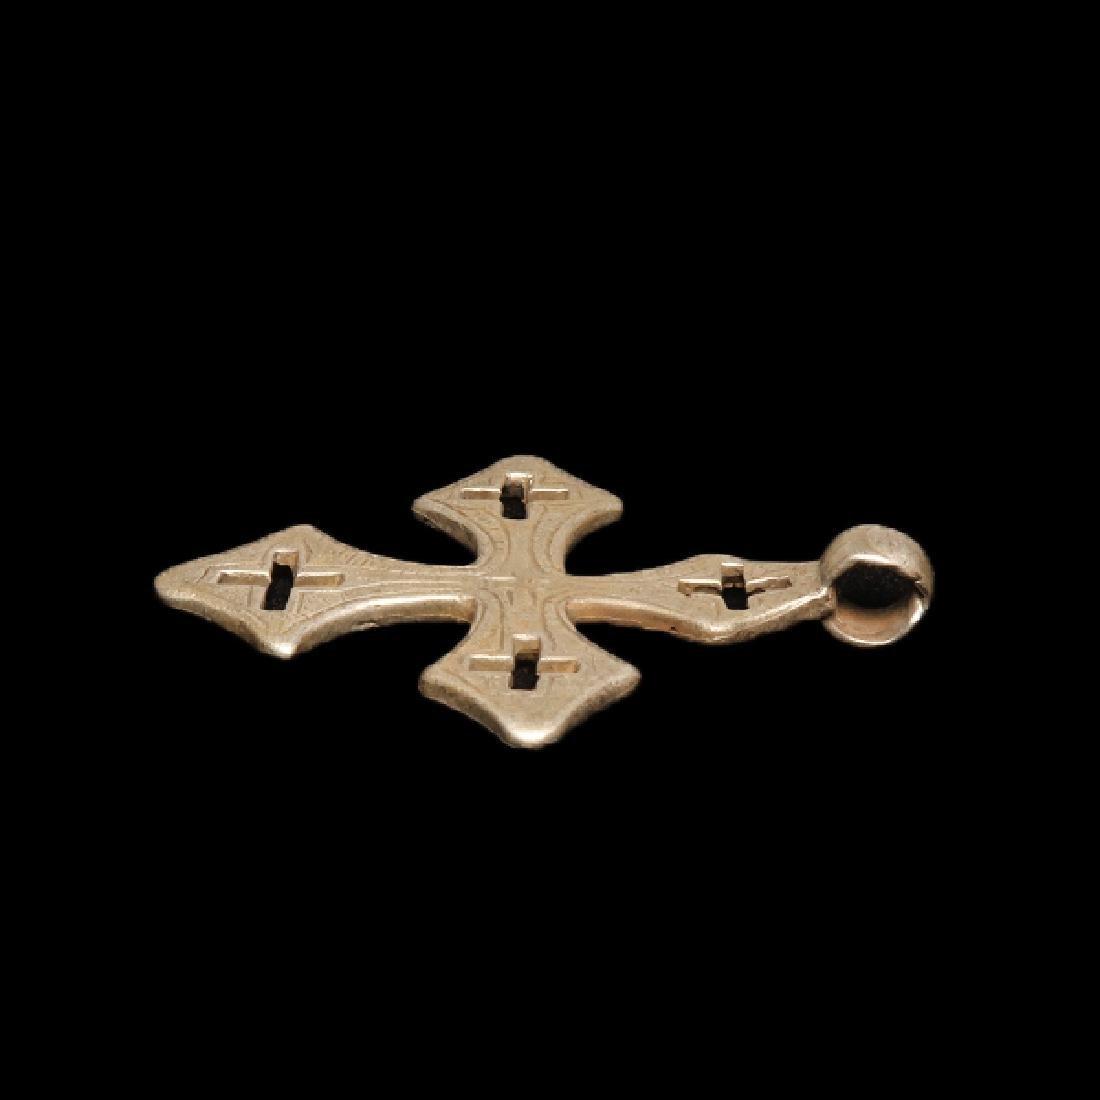 Byzantine Silver Cross, c. 8th-10th Century A.D. - 4